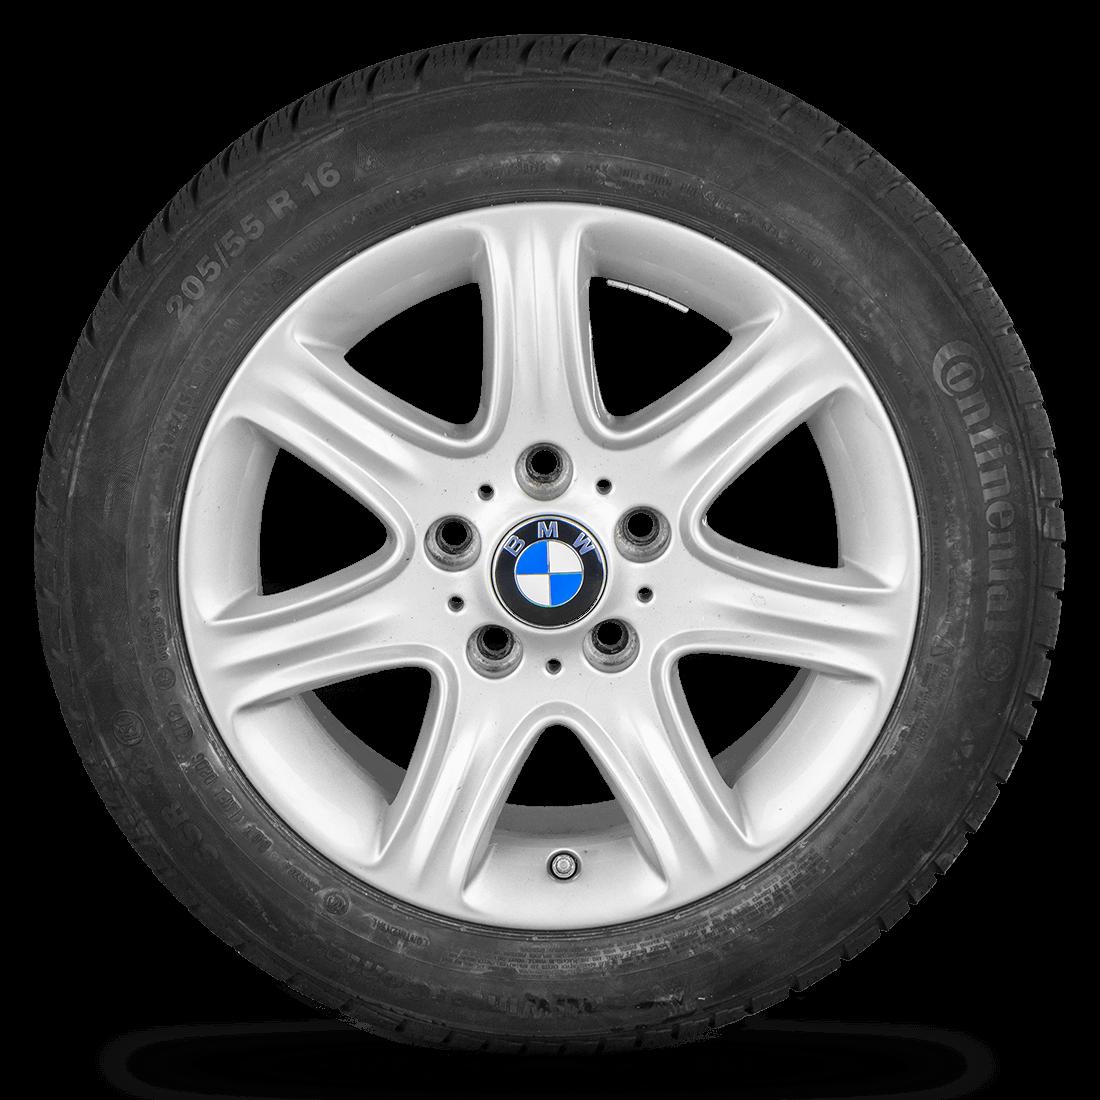 BMW 1er F20 F21 2er F22 F23 16 Zoll Winterreifen Alufelgen Felgen Styling 377